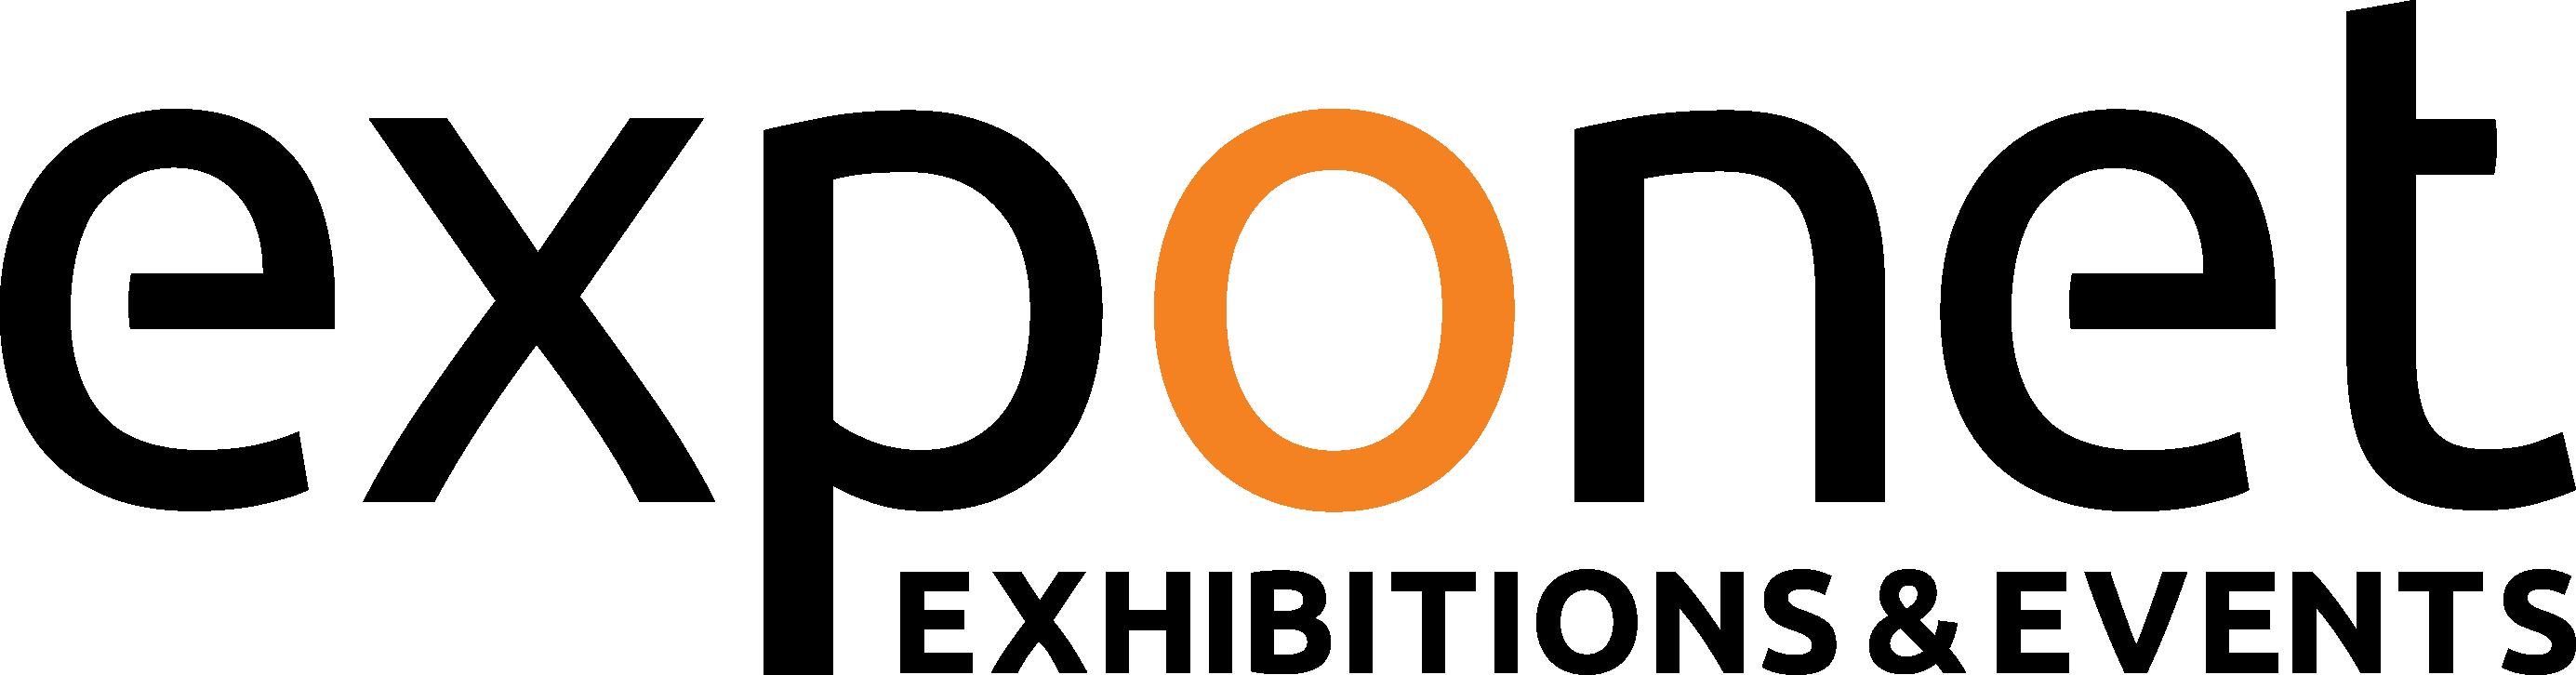 exponet-logo&strap-Black&OrangeCMYK